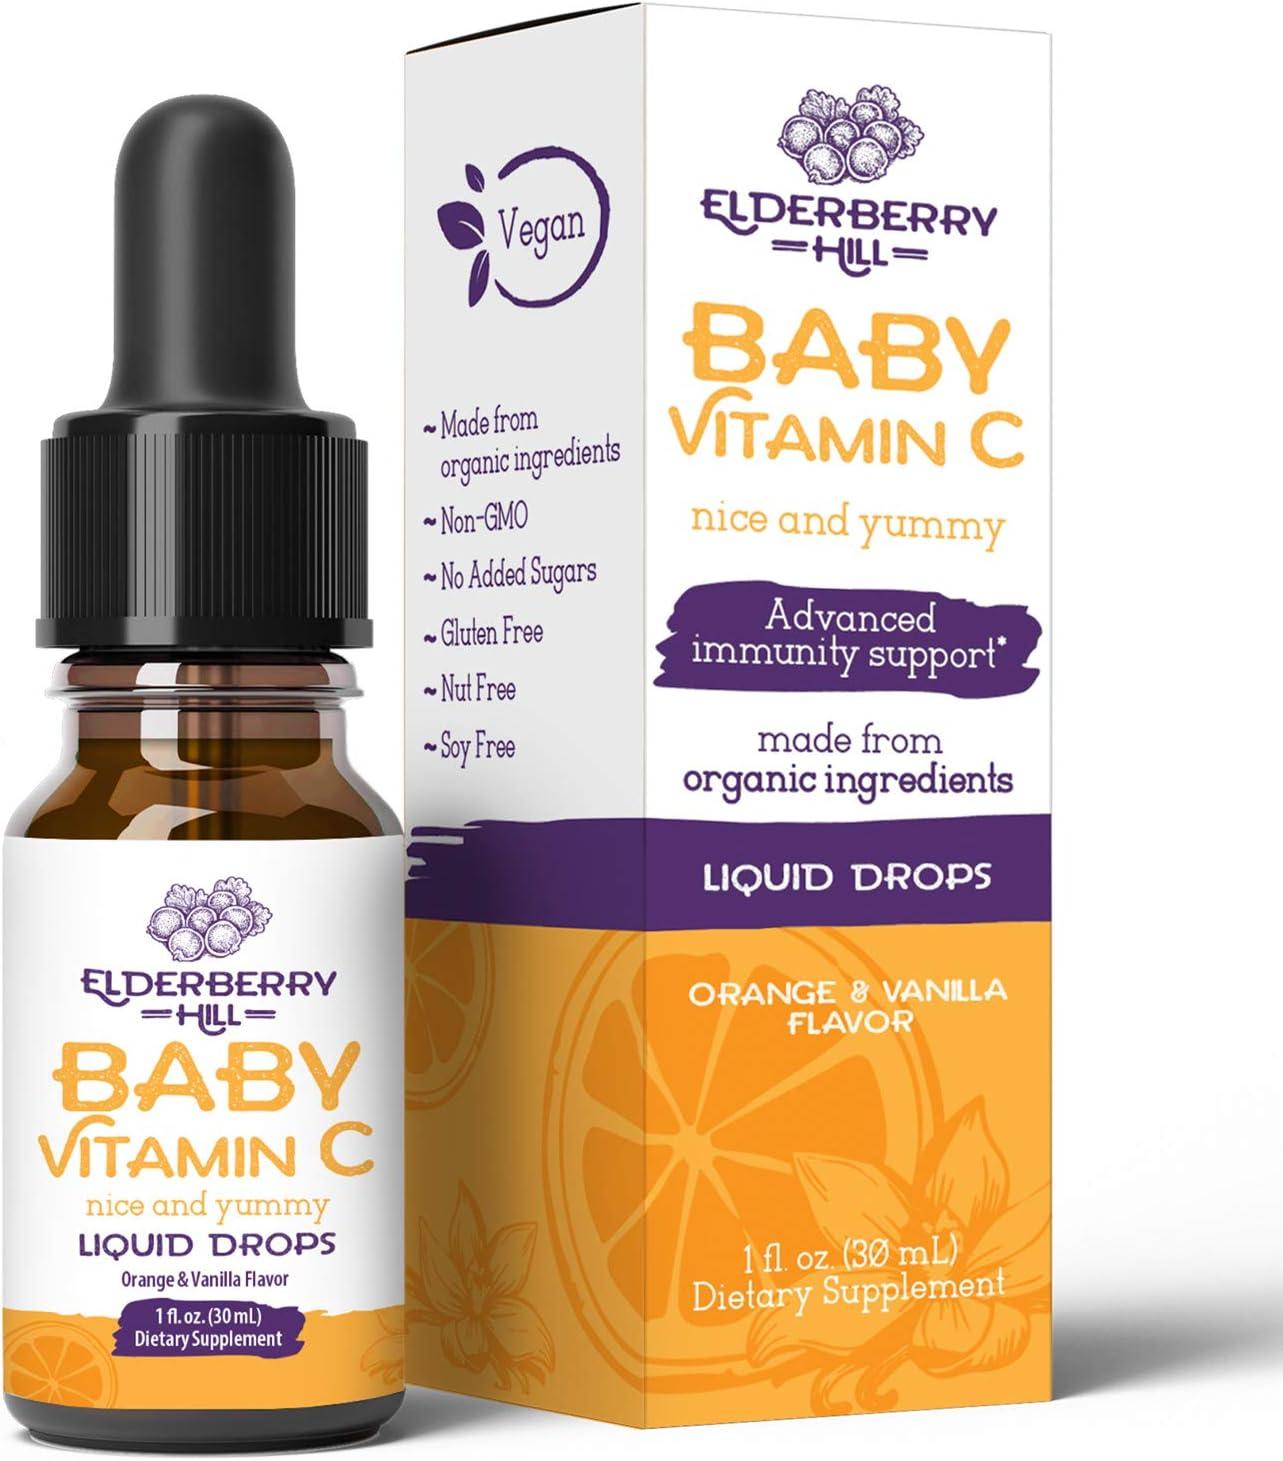 Elderberry Hill Organics Baby Vitamin C Liquid Drops from Organic Amla Fruit, Vegan & Non GMO Organic VIT C Immune Support Supplement for Kids 1 fl. oz (30 ml)